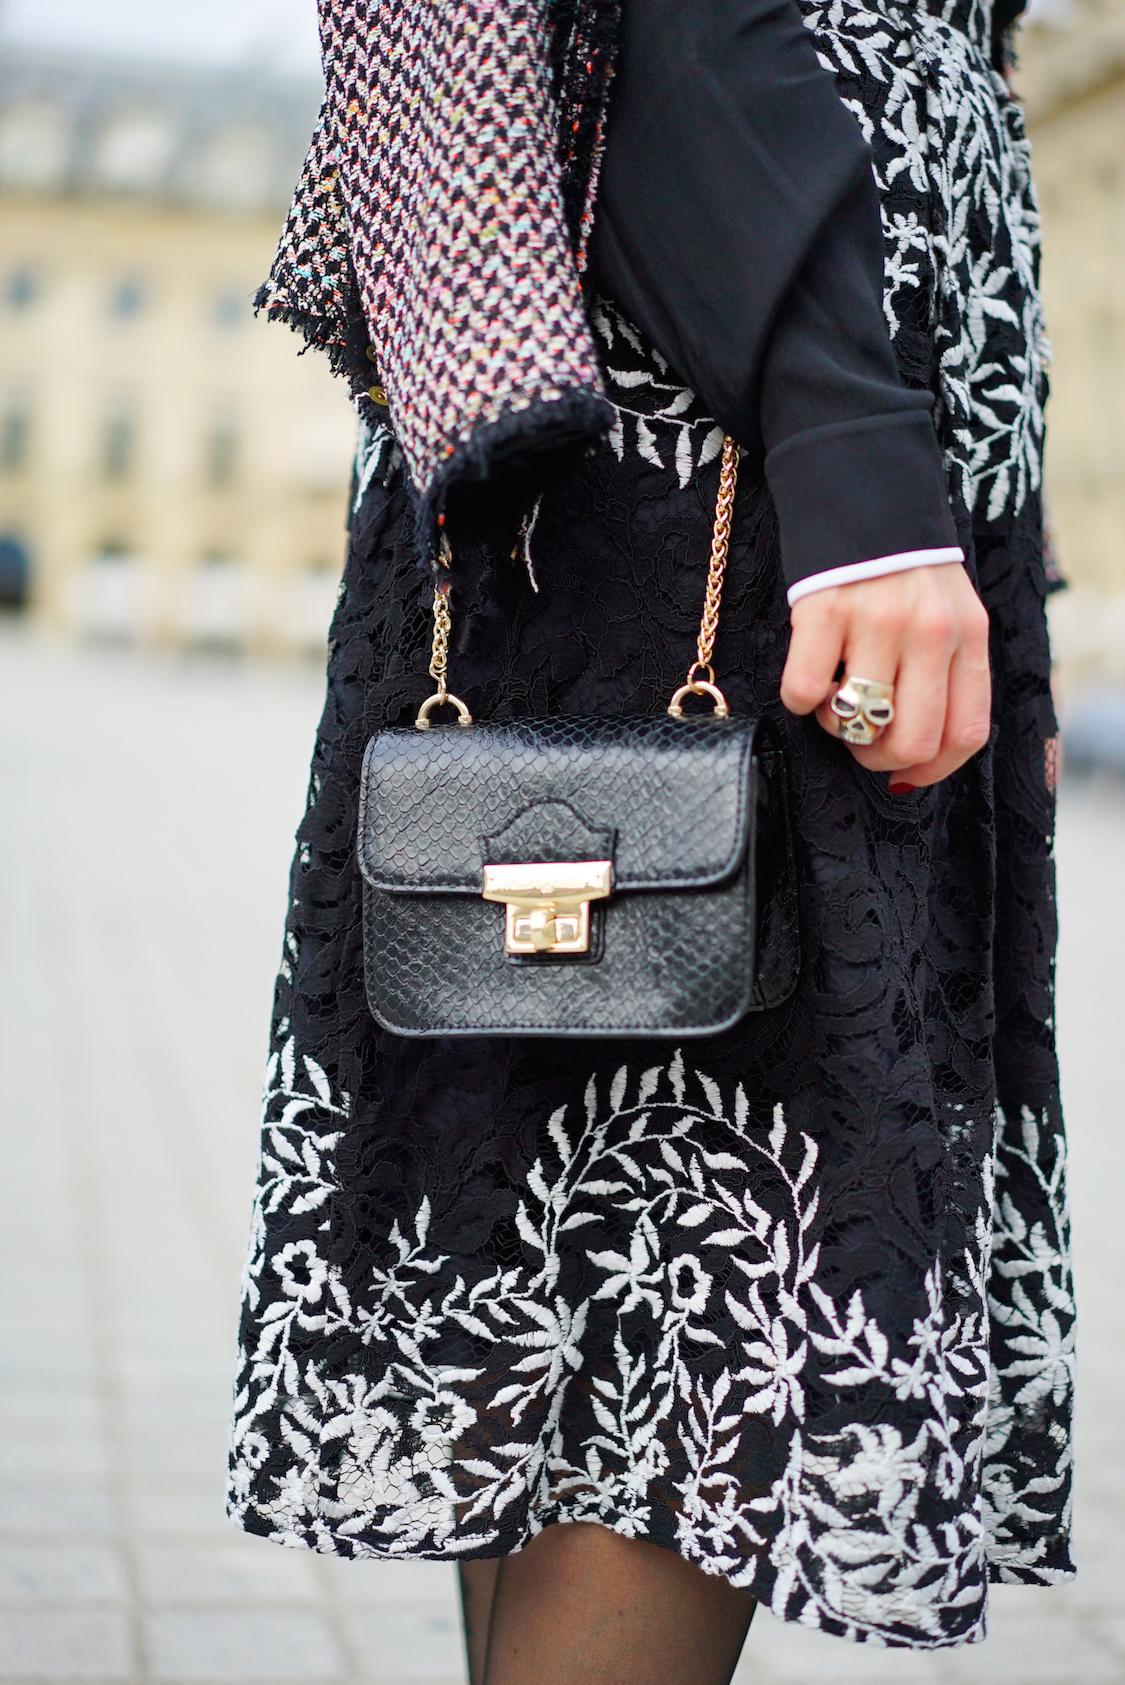 look-paris-fashion-week-re-see-valentino-2015-danielle-noce-5